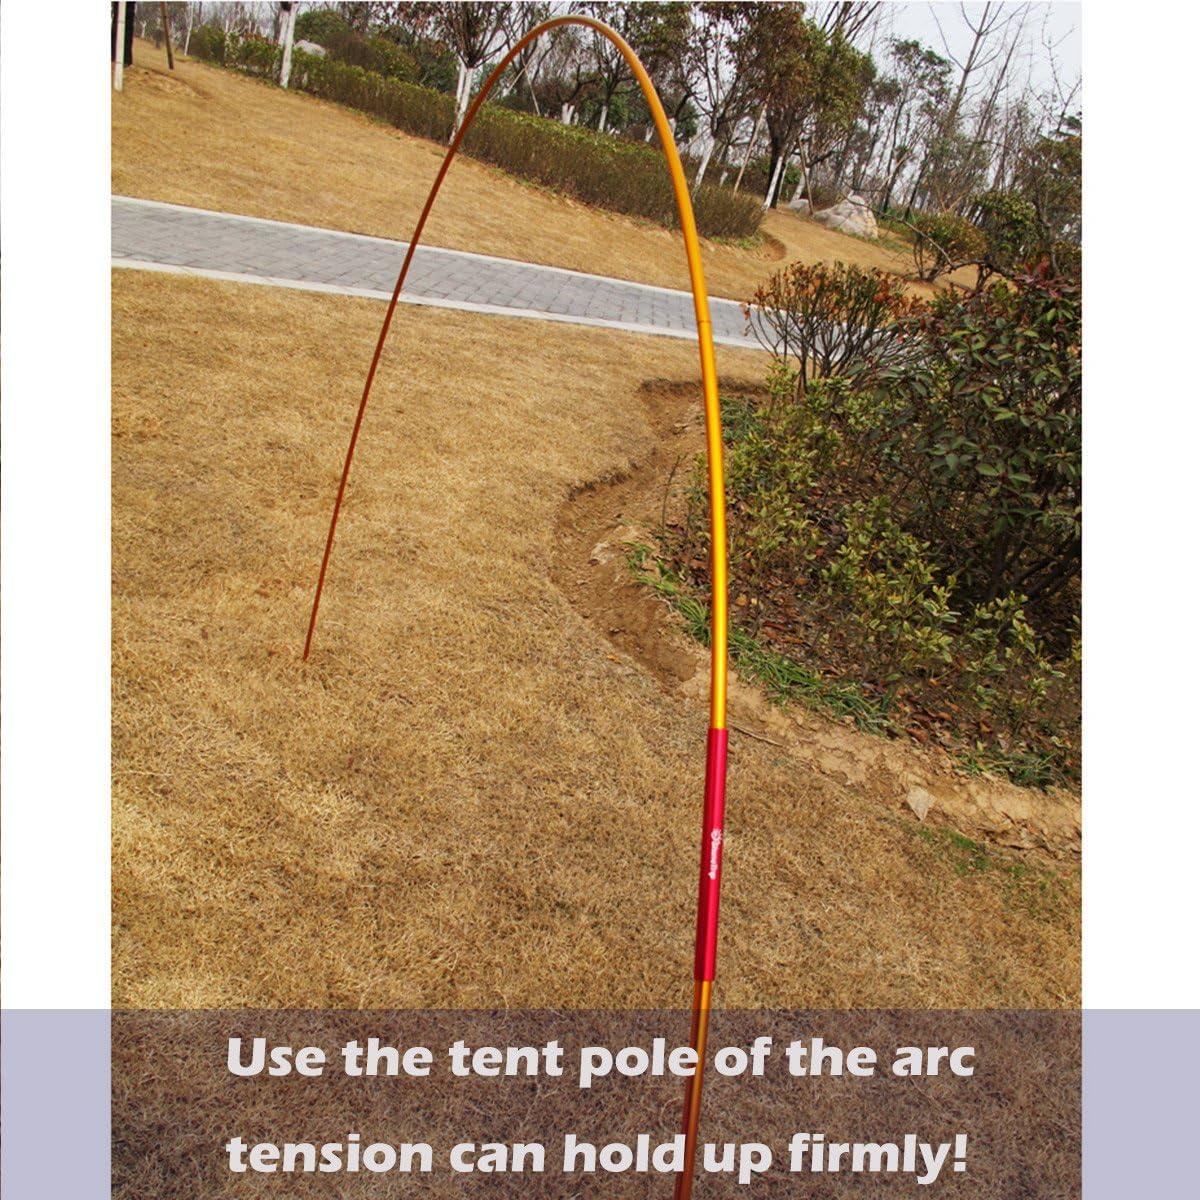 Azarxis Tent Pole Repair Splint Repair Kit Spare Repair Emergency Tube for Diameter 7.9-8.5mm Tent Pole